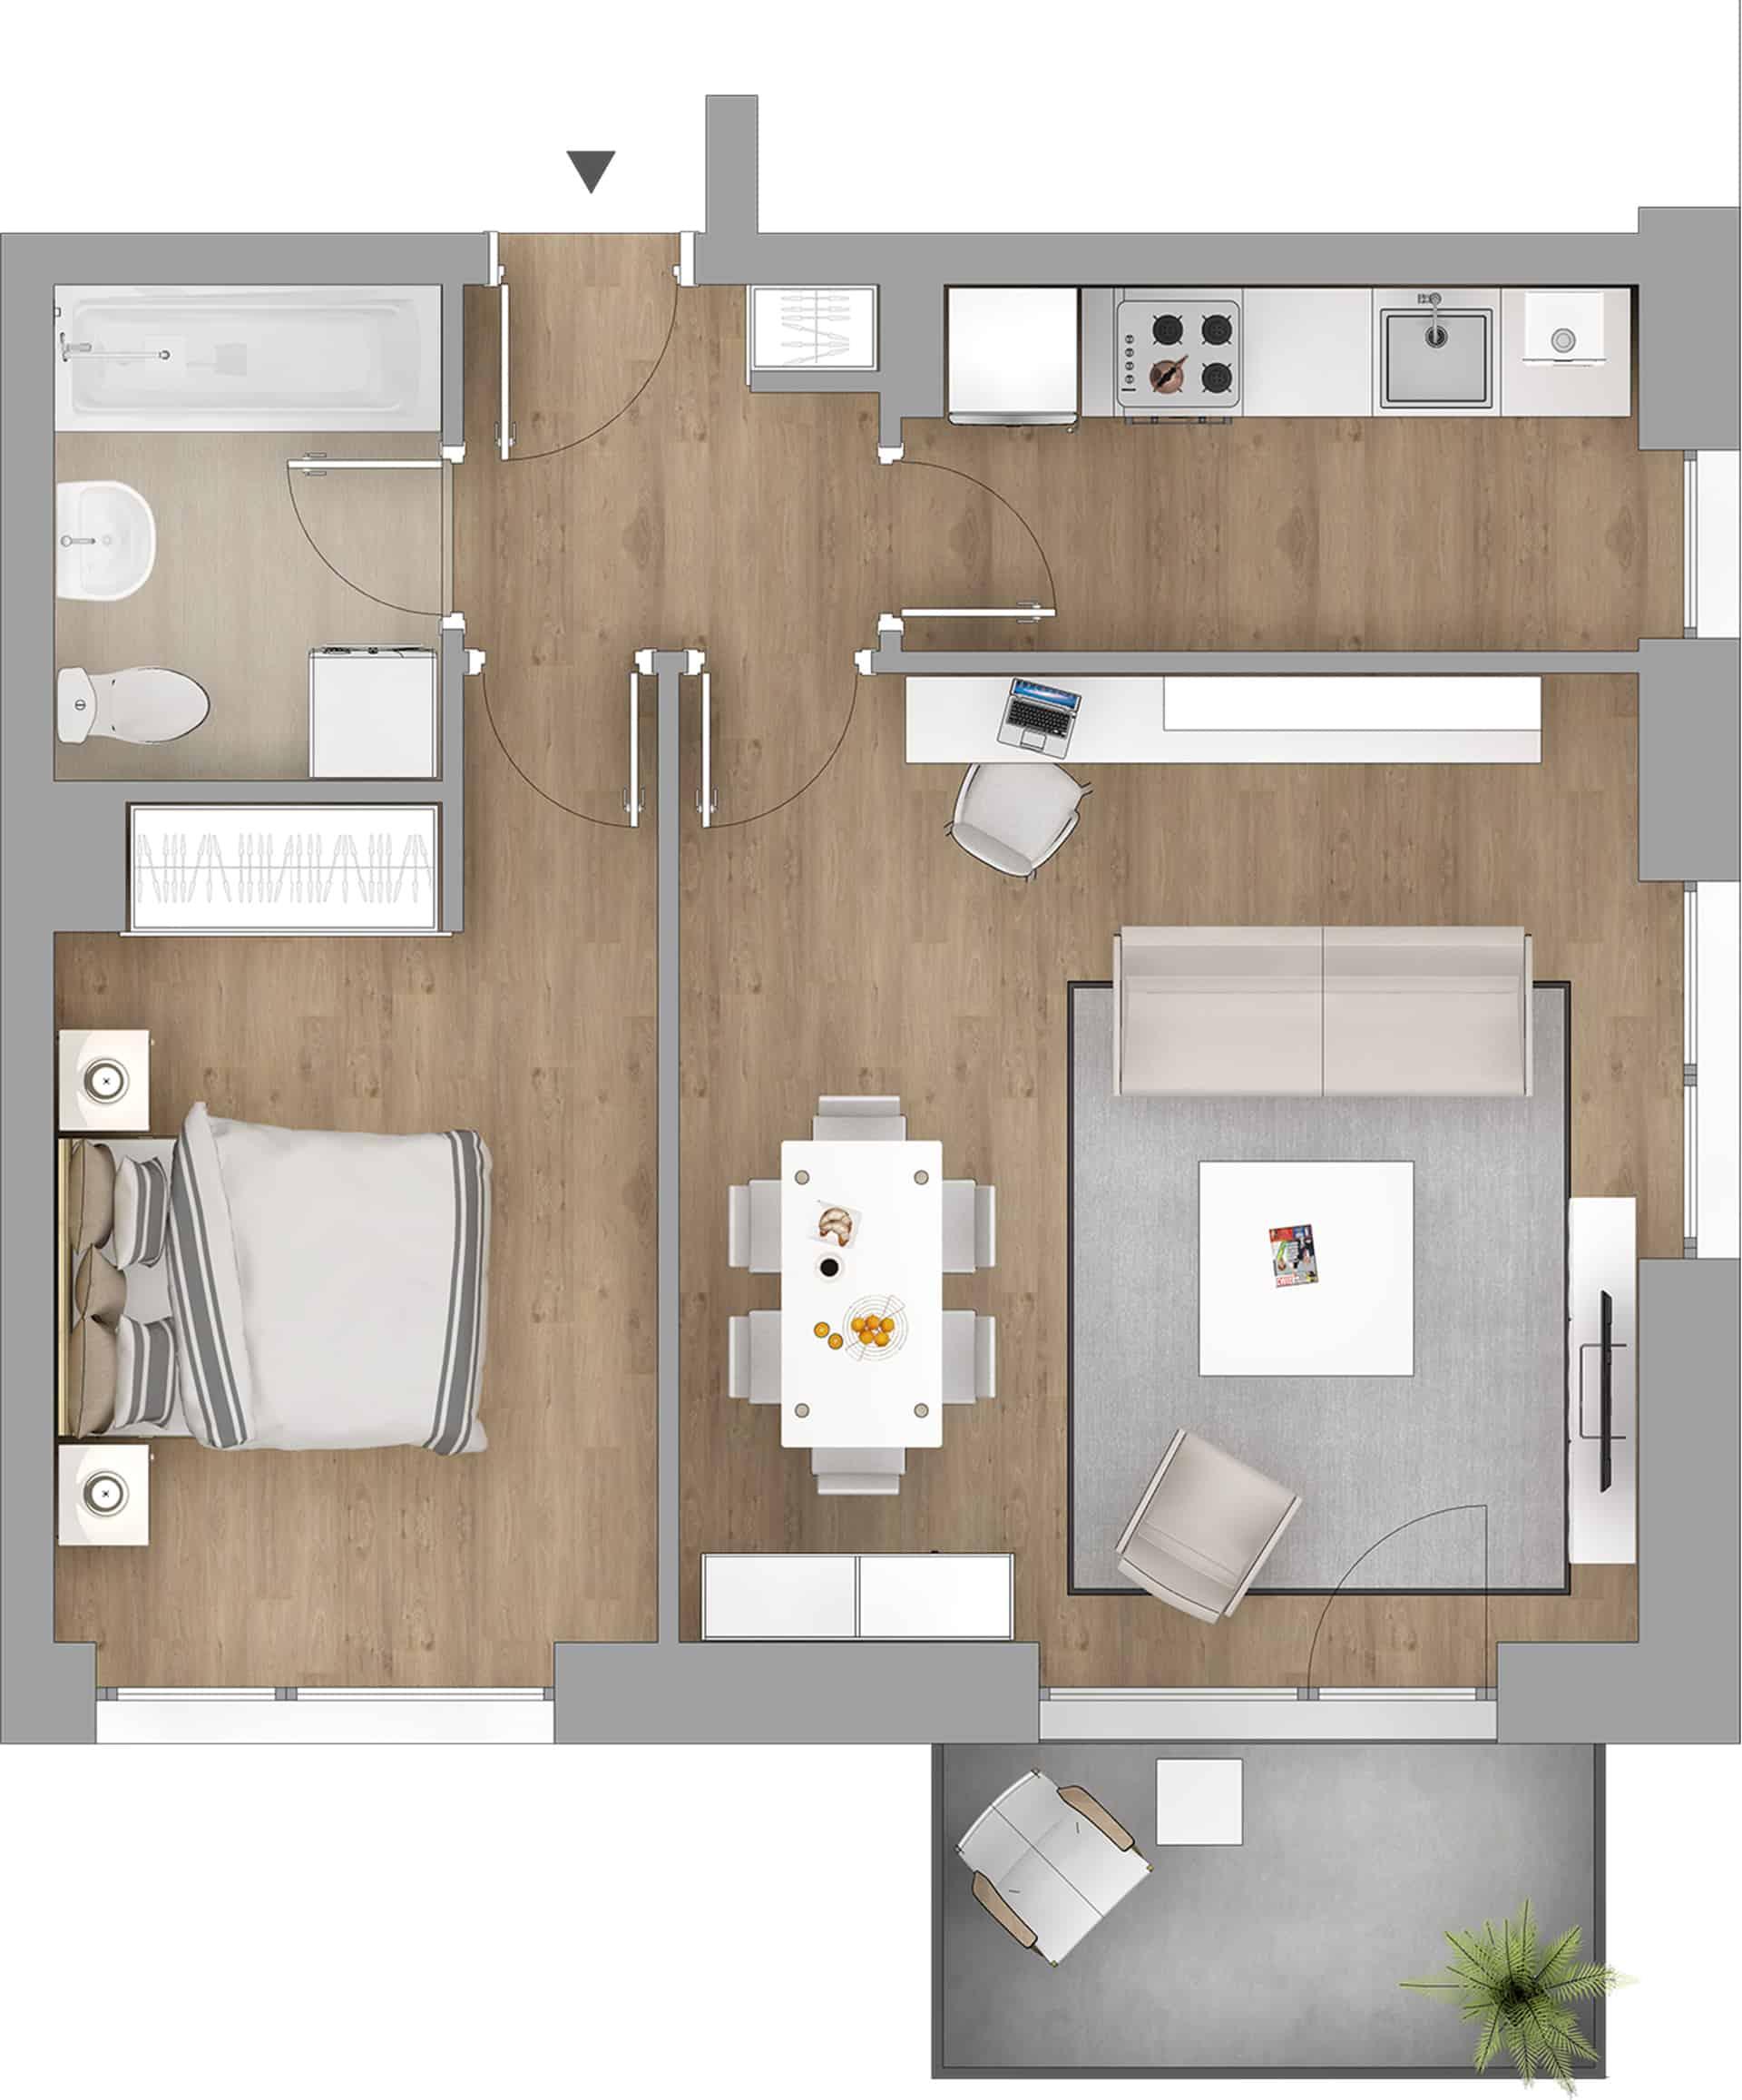 apartamente bucuresti 2 camere